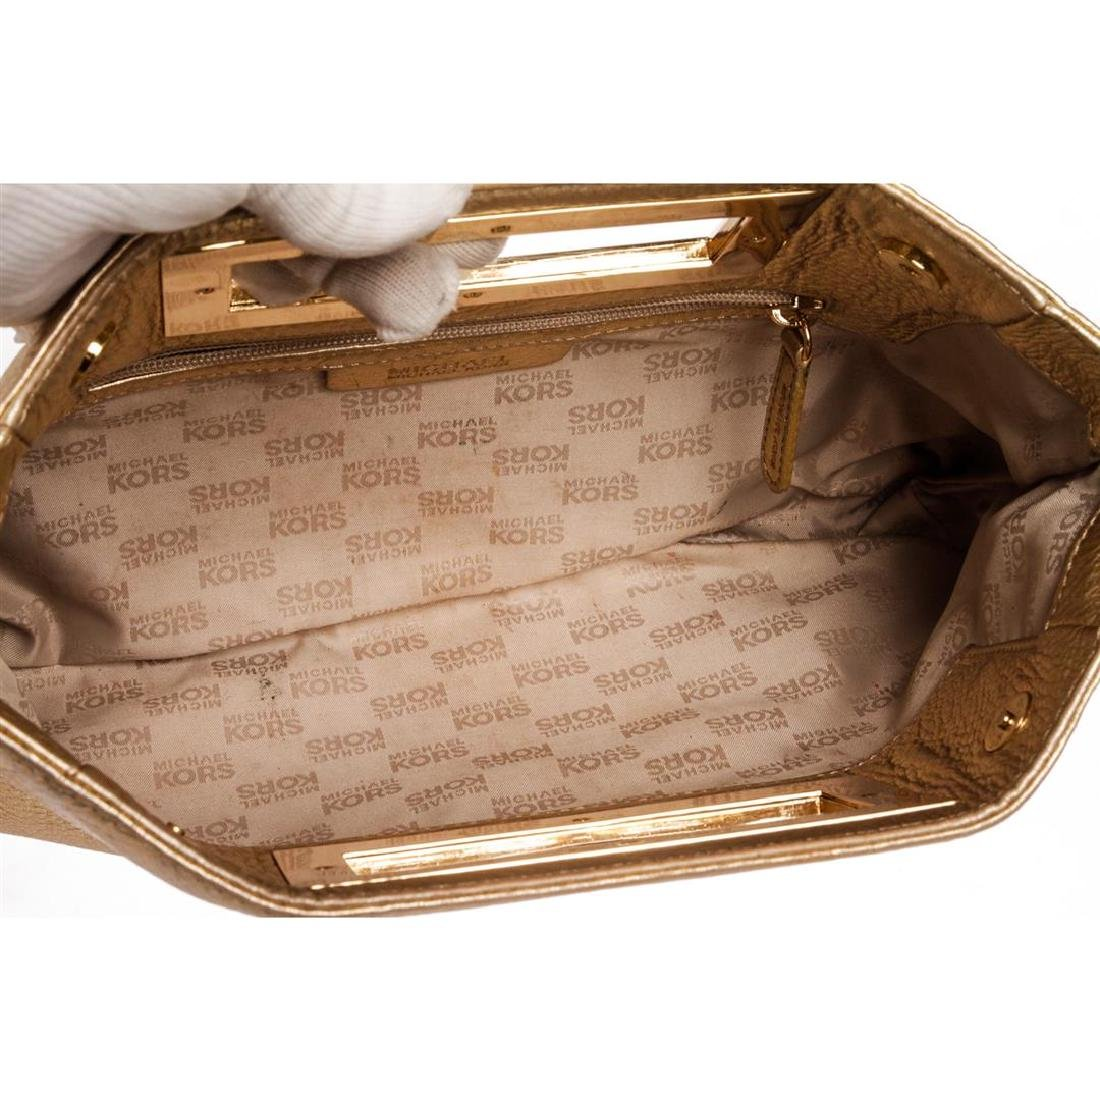 Michael Kors Pale Gold Leather Berkley Clutch Handbag - 5